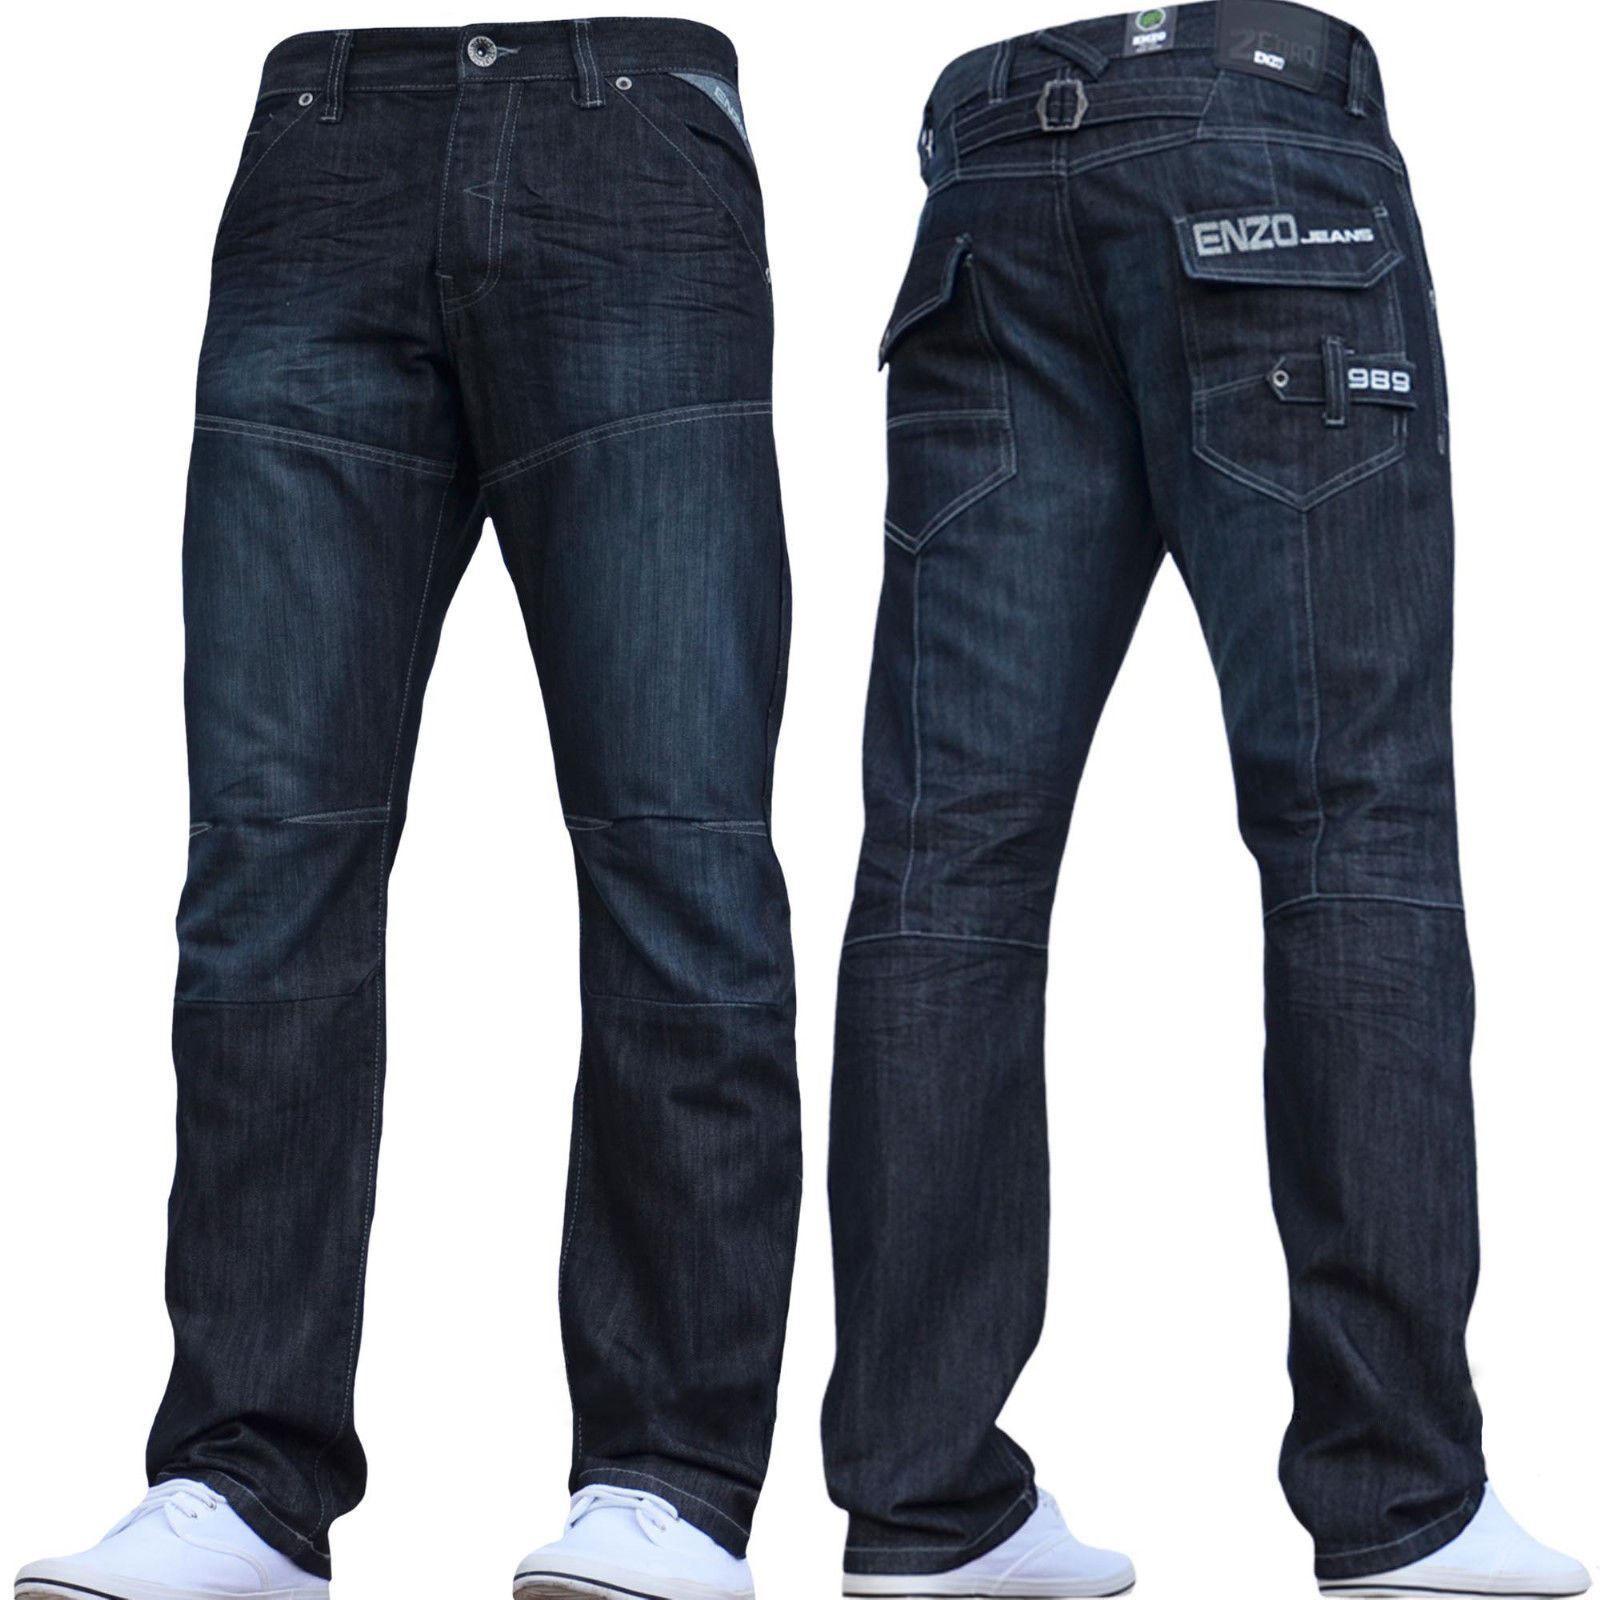 Übergrößen Herren Enzo Modische Jeans Toller Toller Toller Detail Style Ez 244 -  | Outlet Store Online  f2c4e7